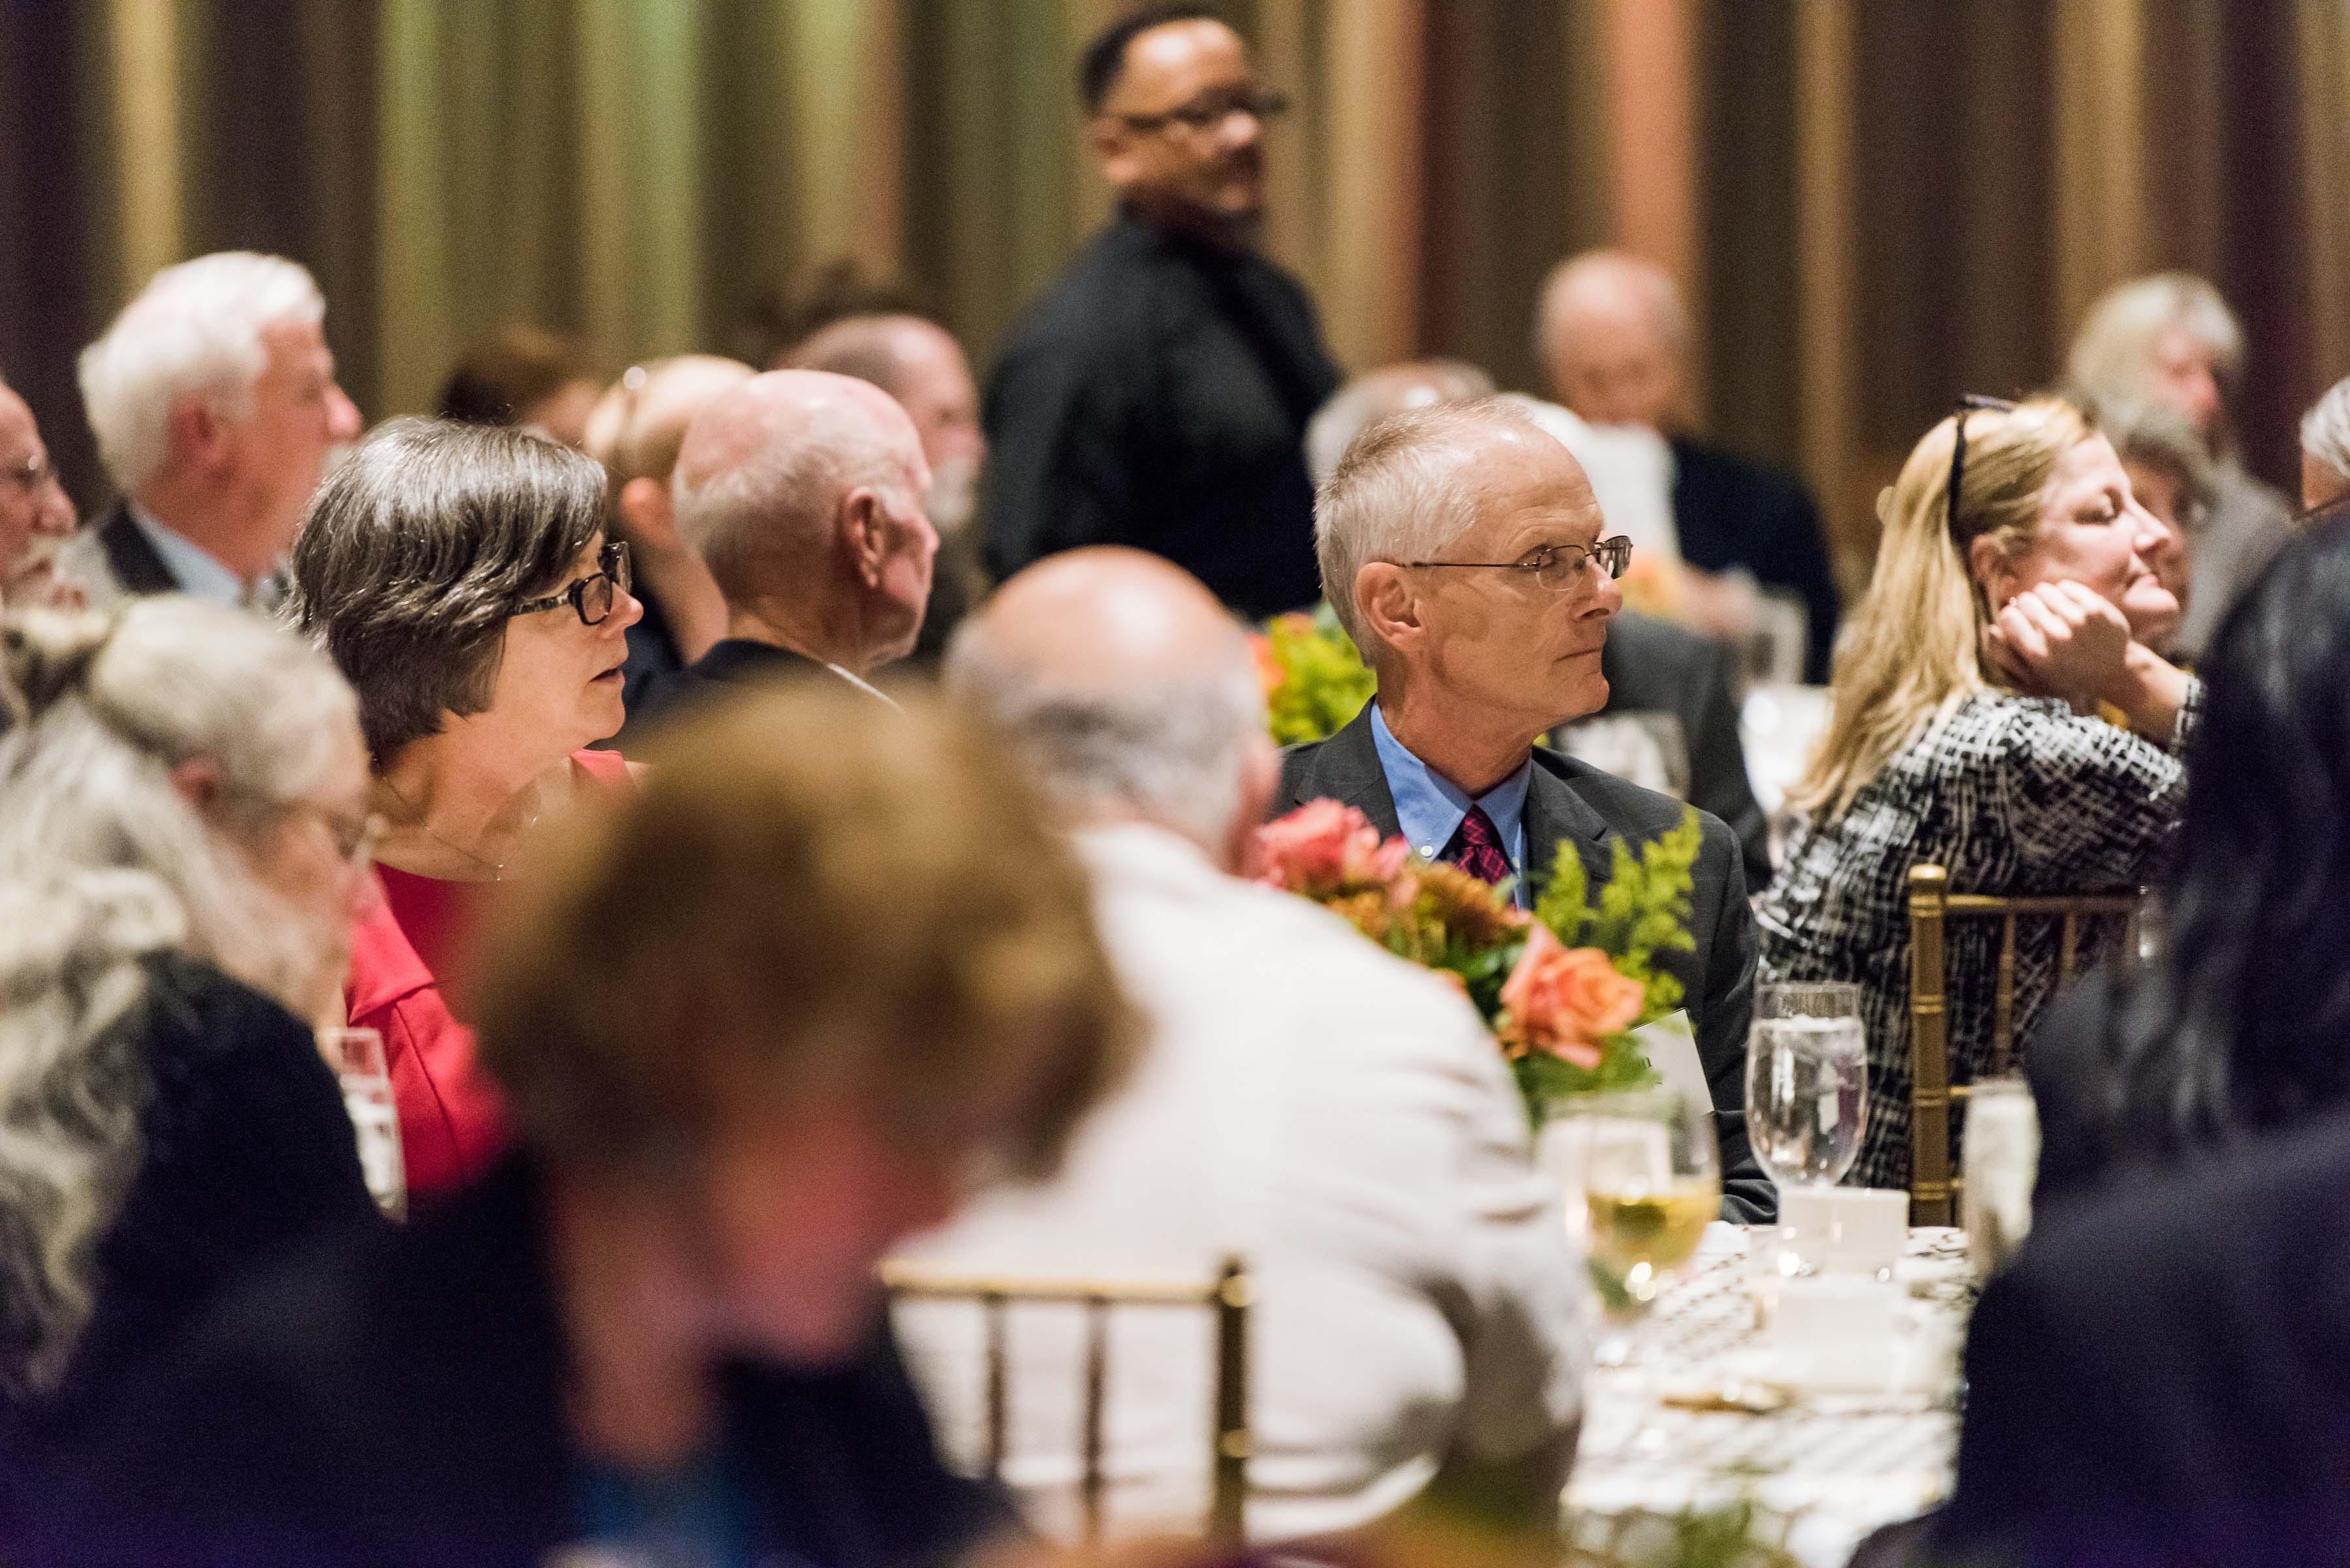 Guests listen to Dr. Laviks talk